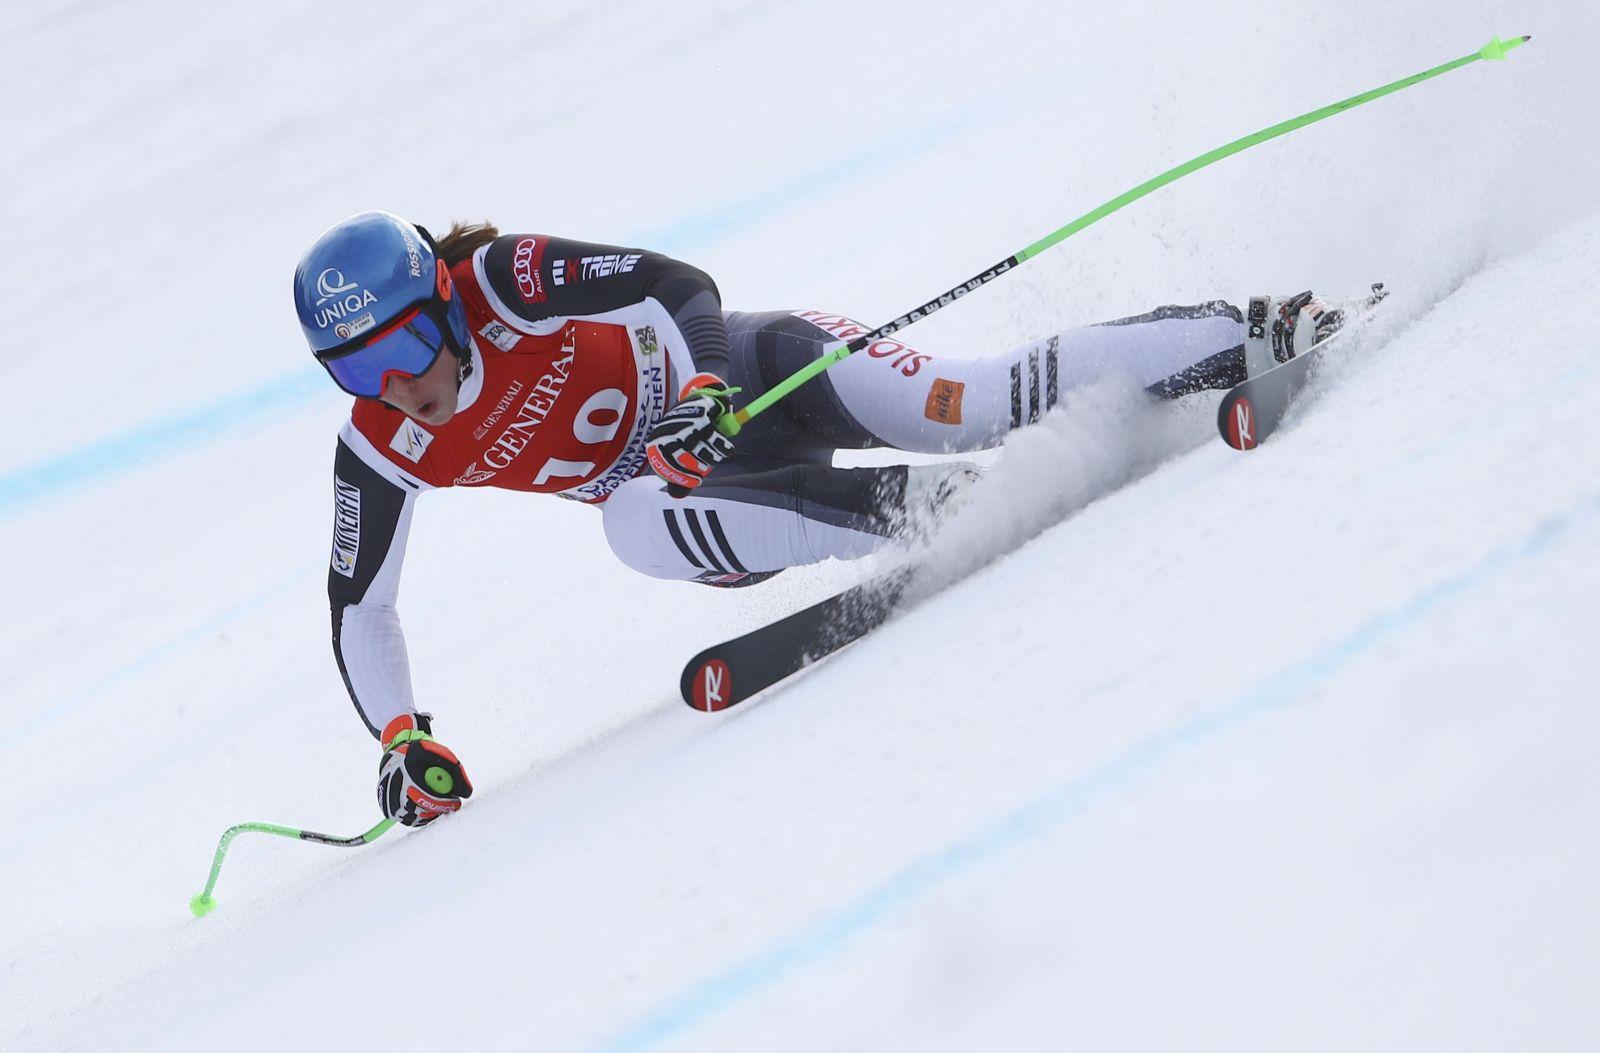 Fantastická Petra Vlhová uchmatla 2. miesto v super obrovskom slalome v Garmisch-Partenkirchene